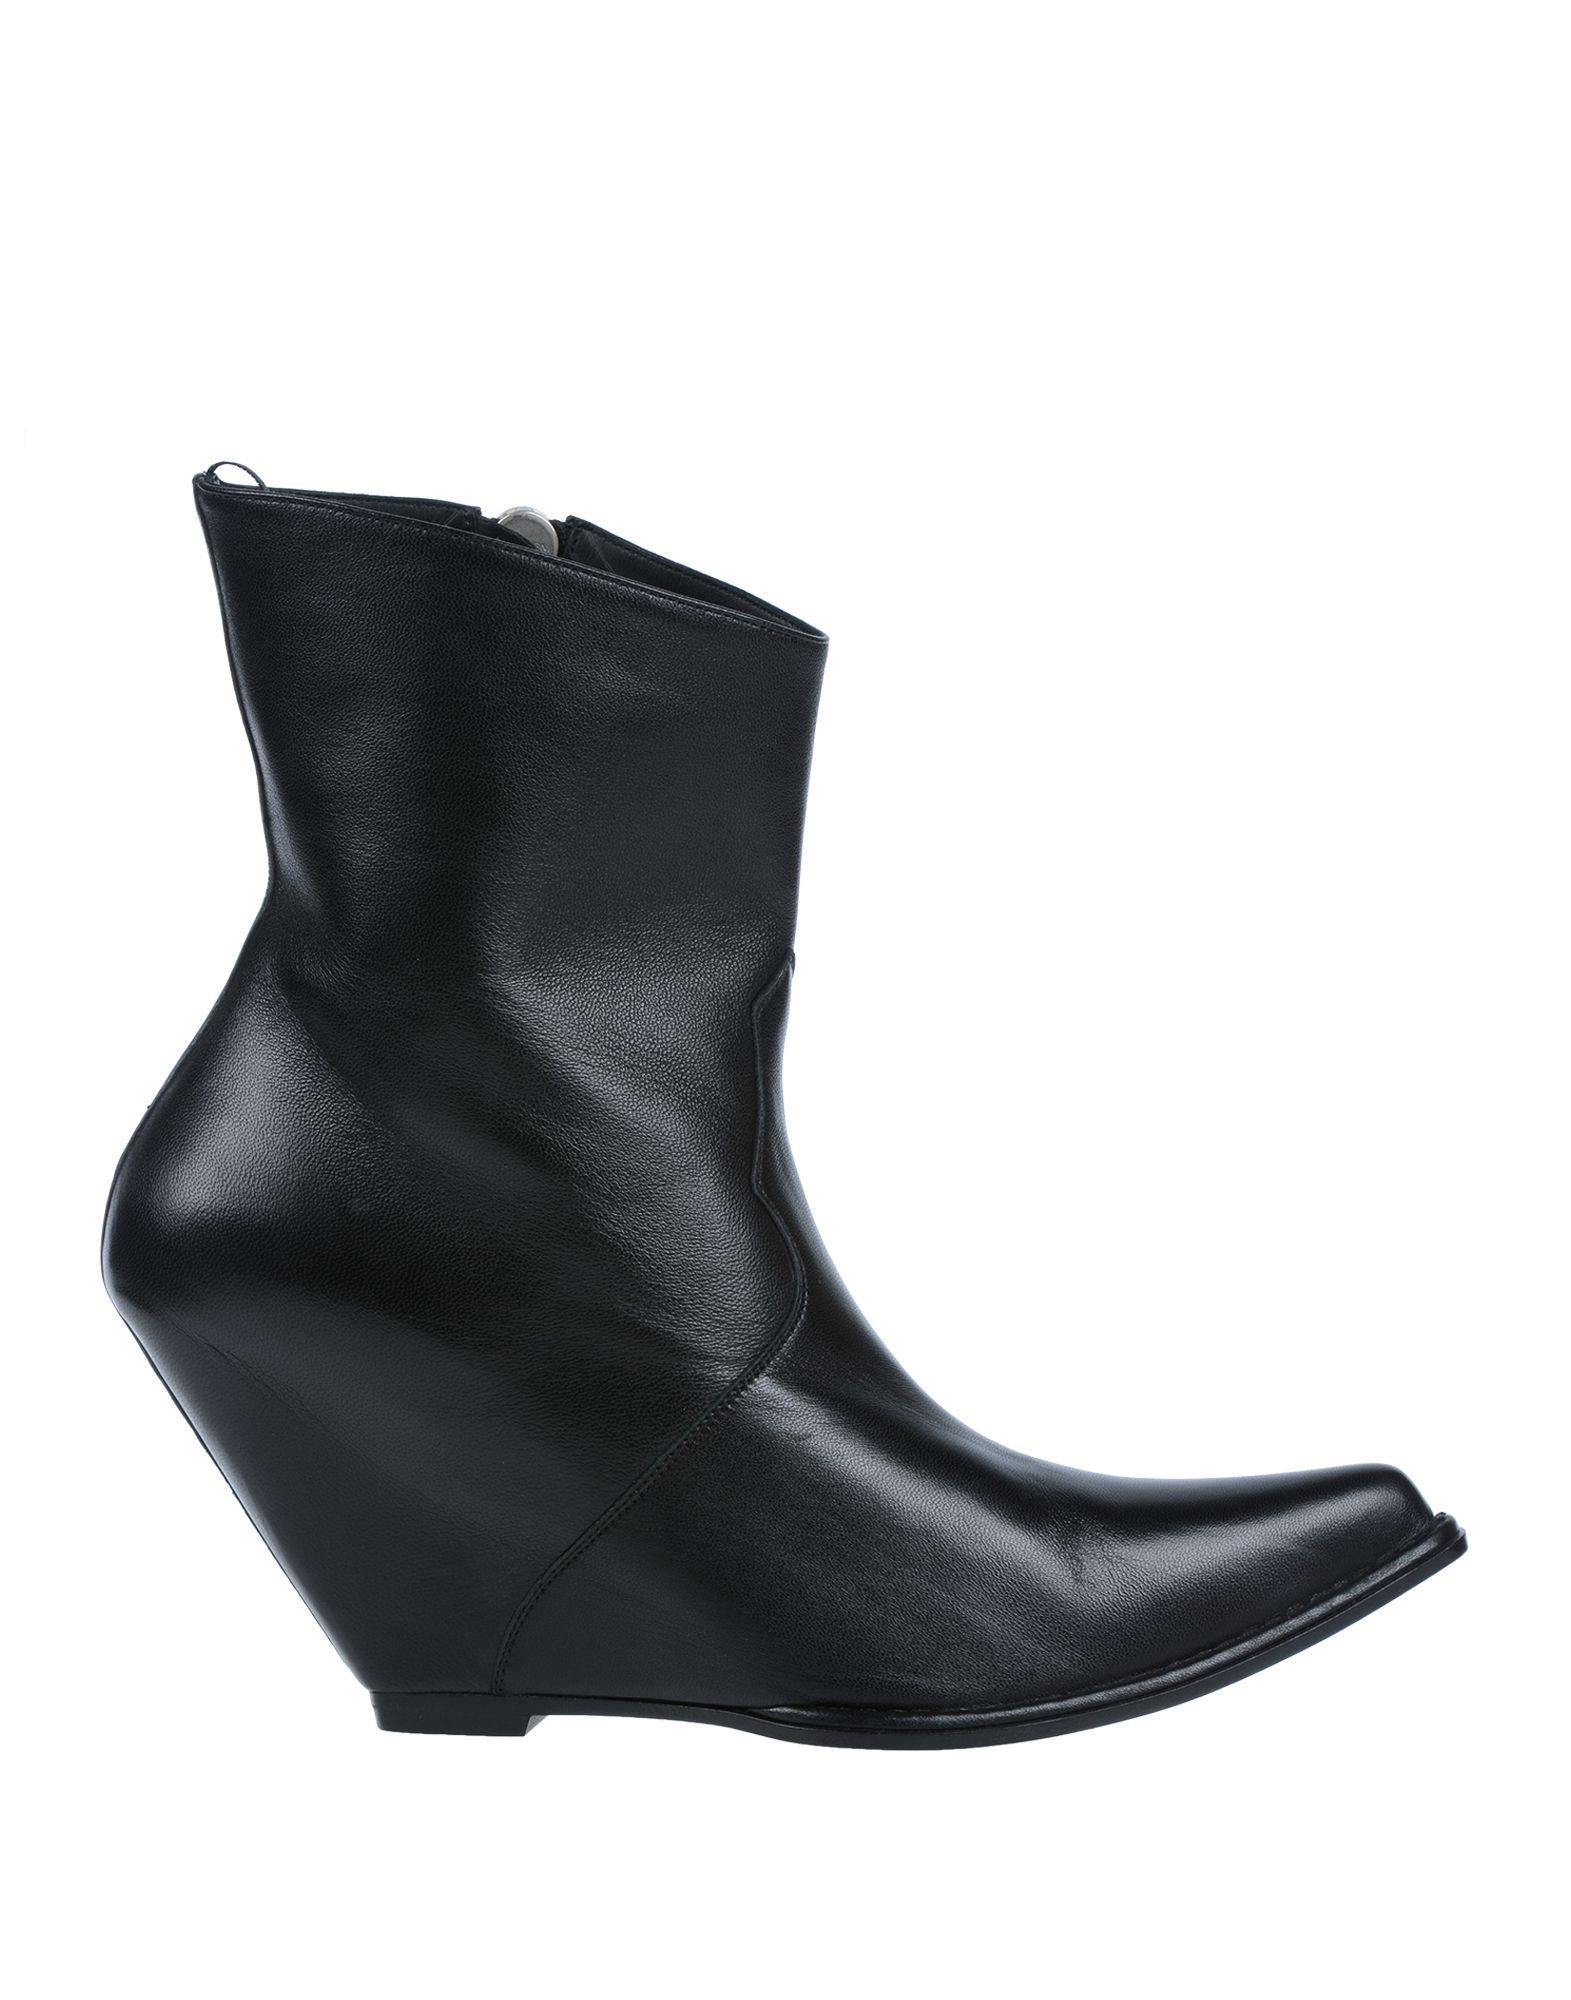 BEN TAVERNITI™ UNRAVEL PROJECT Полусапоги и высокие ботинки ben taverniti™ unravel project полусапоги и высокие ботинки